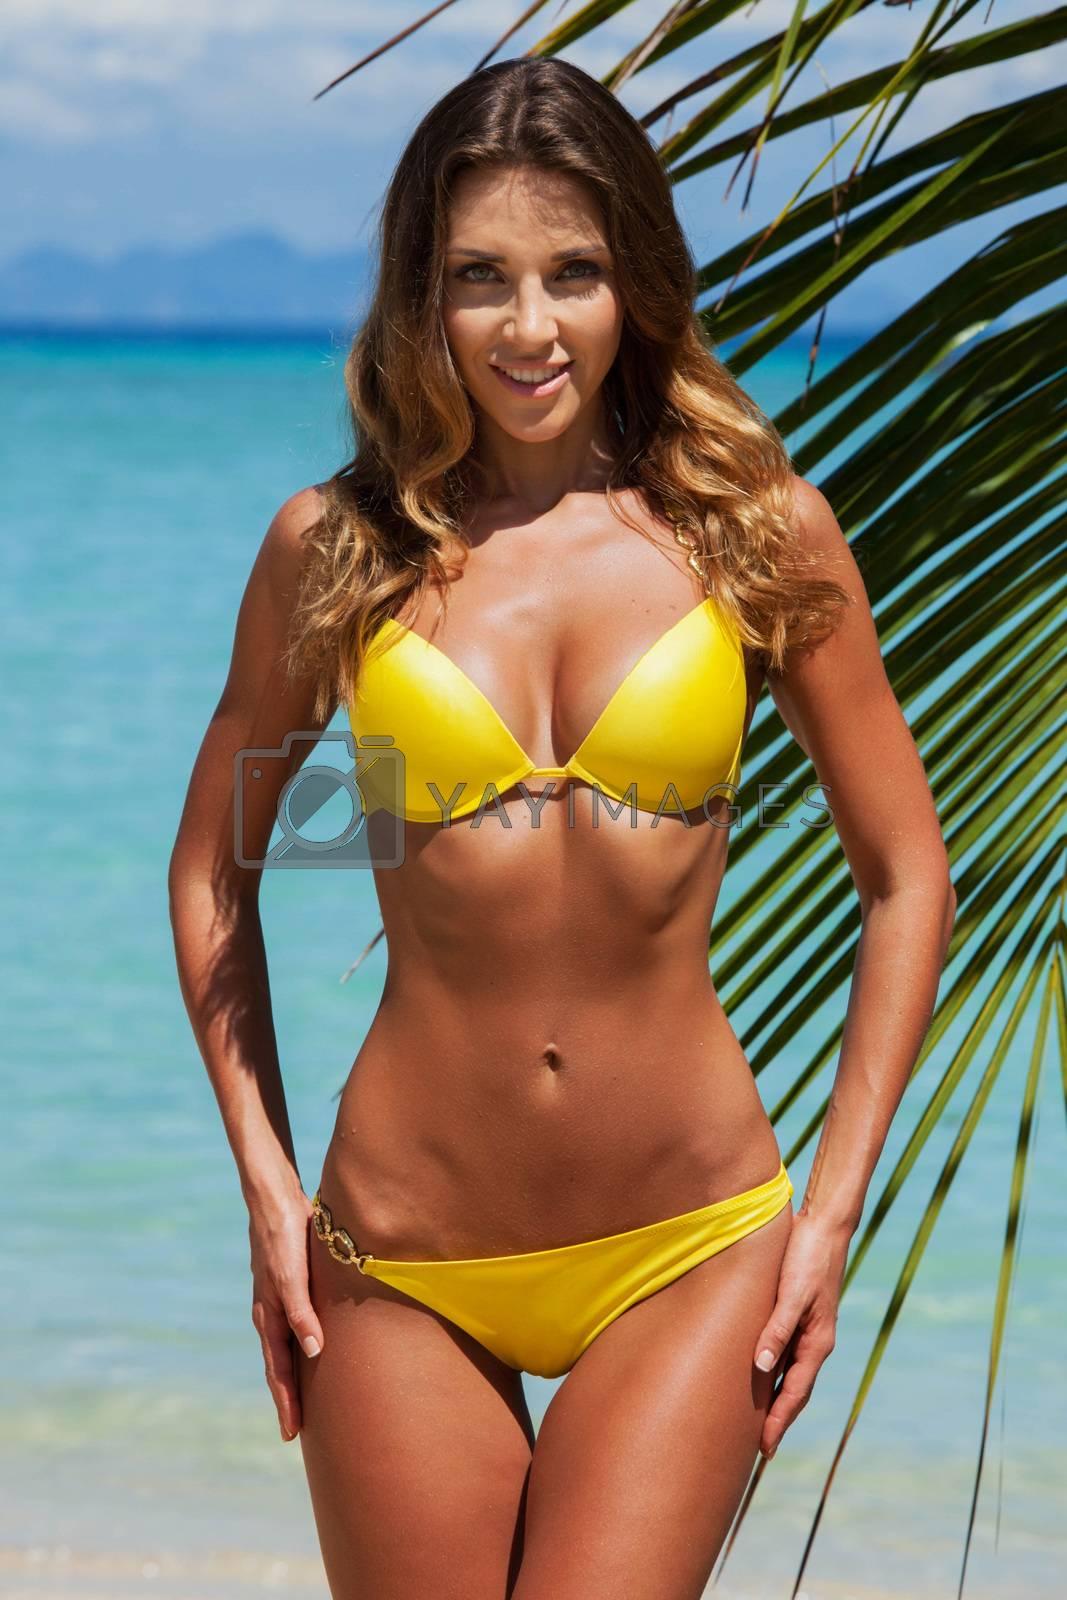 Young female in yellow bikini enjoying sunny day under palm tree on the tropical beach